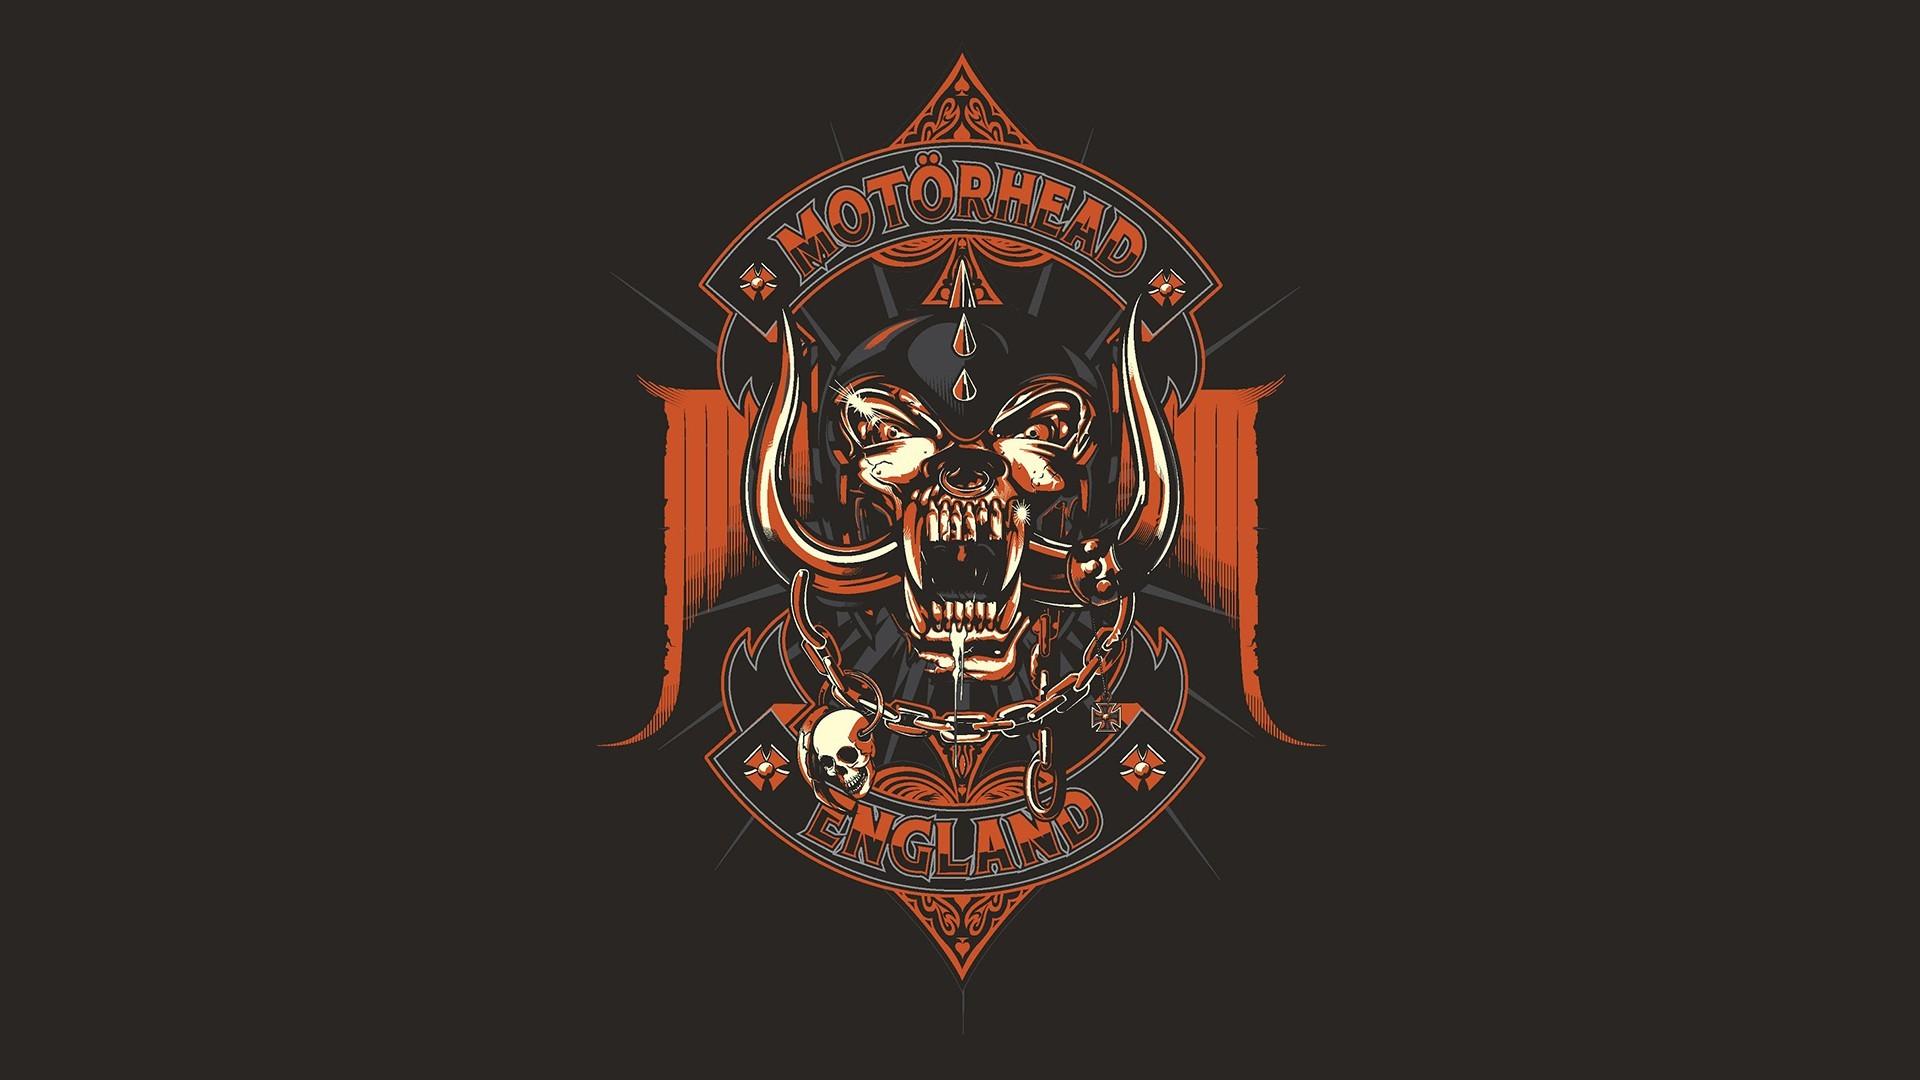 Motorhead england logo hd wallpaper background – HD Wallpapers